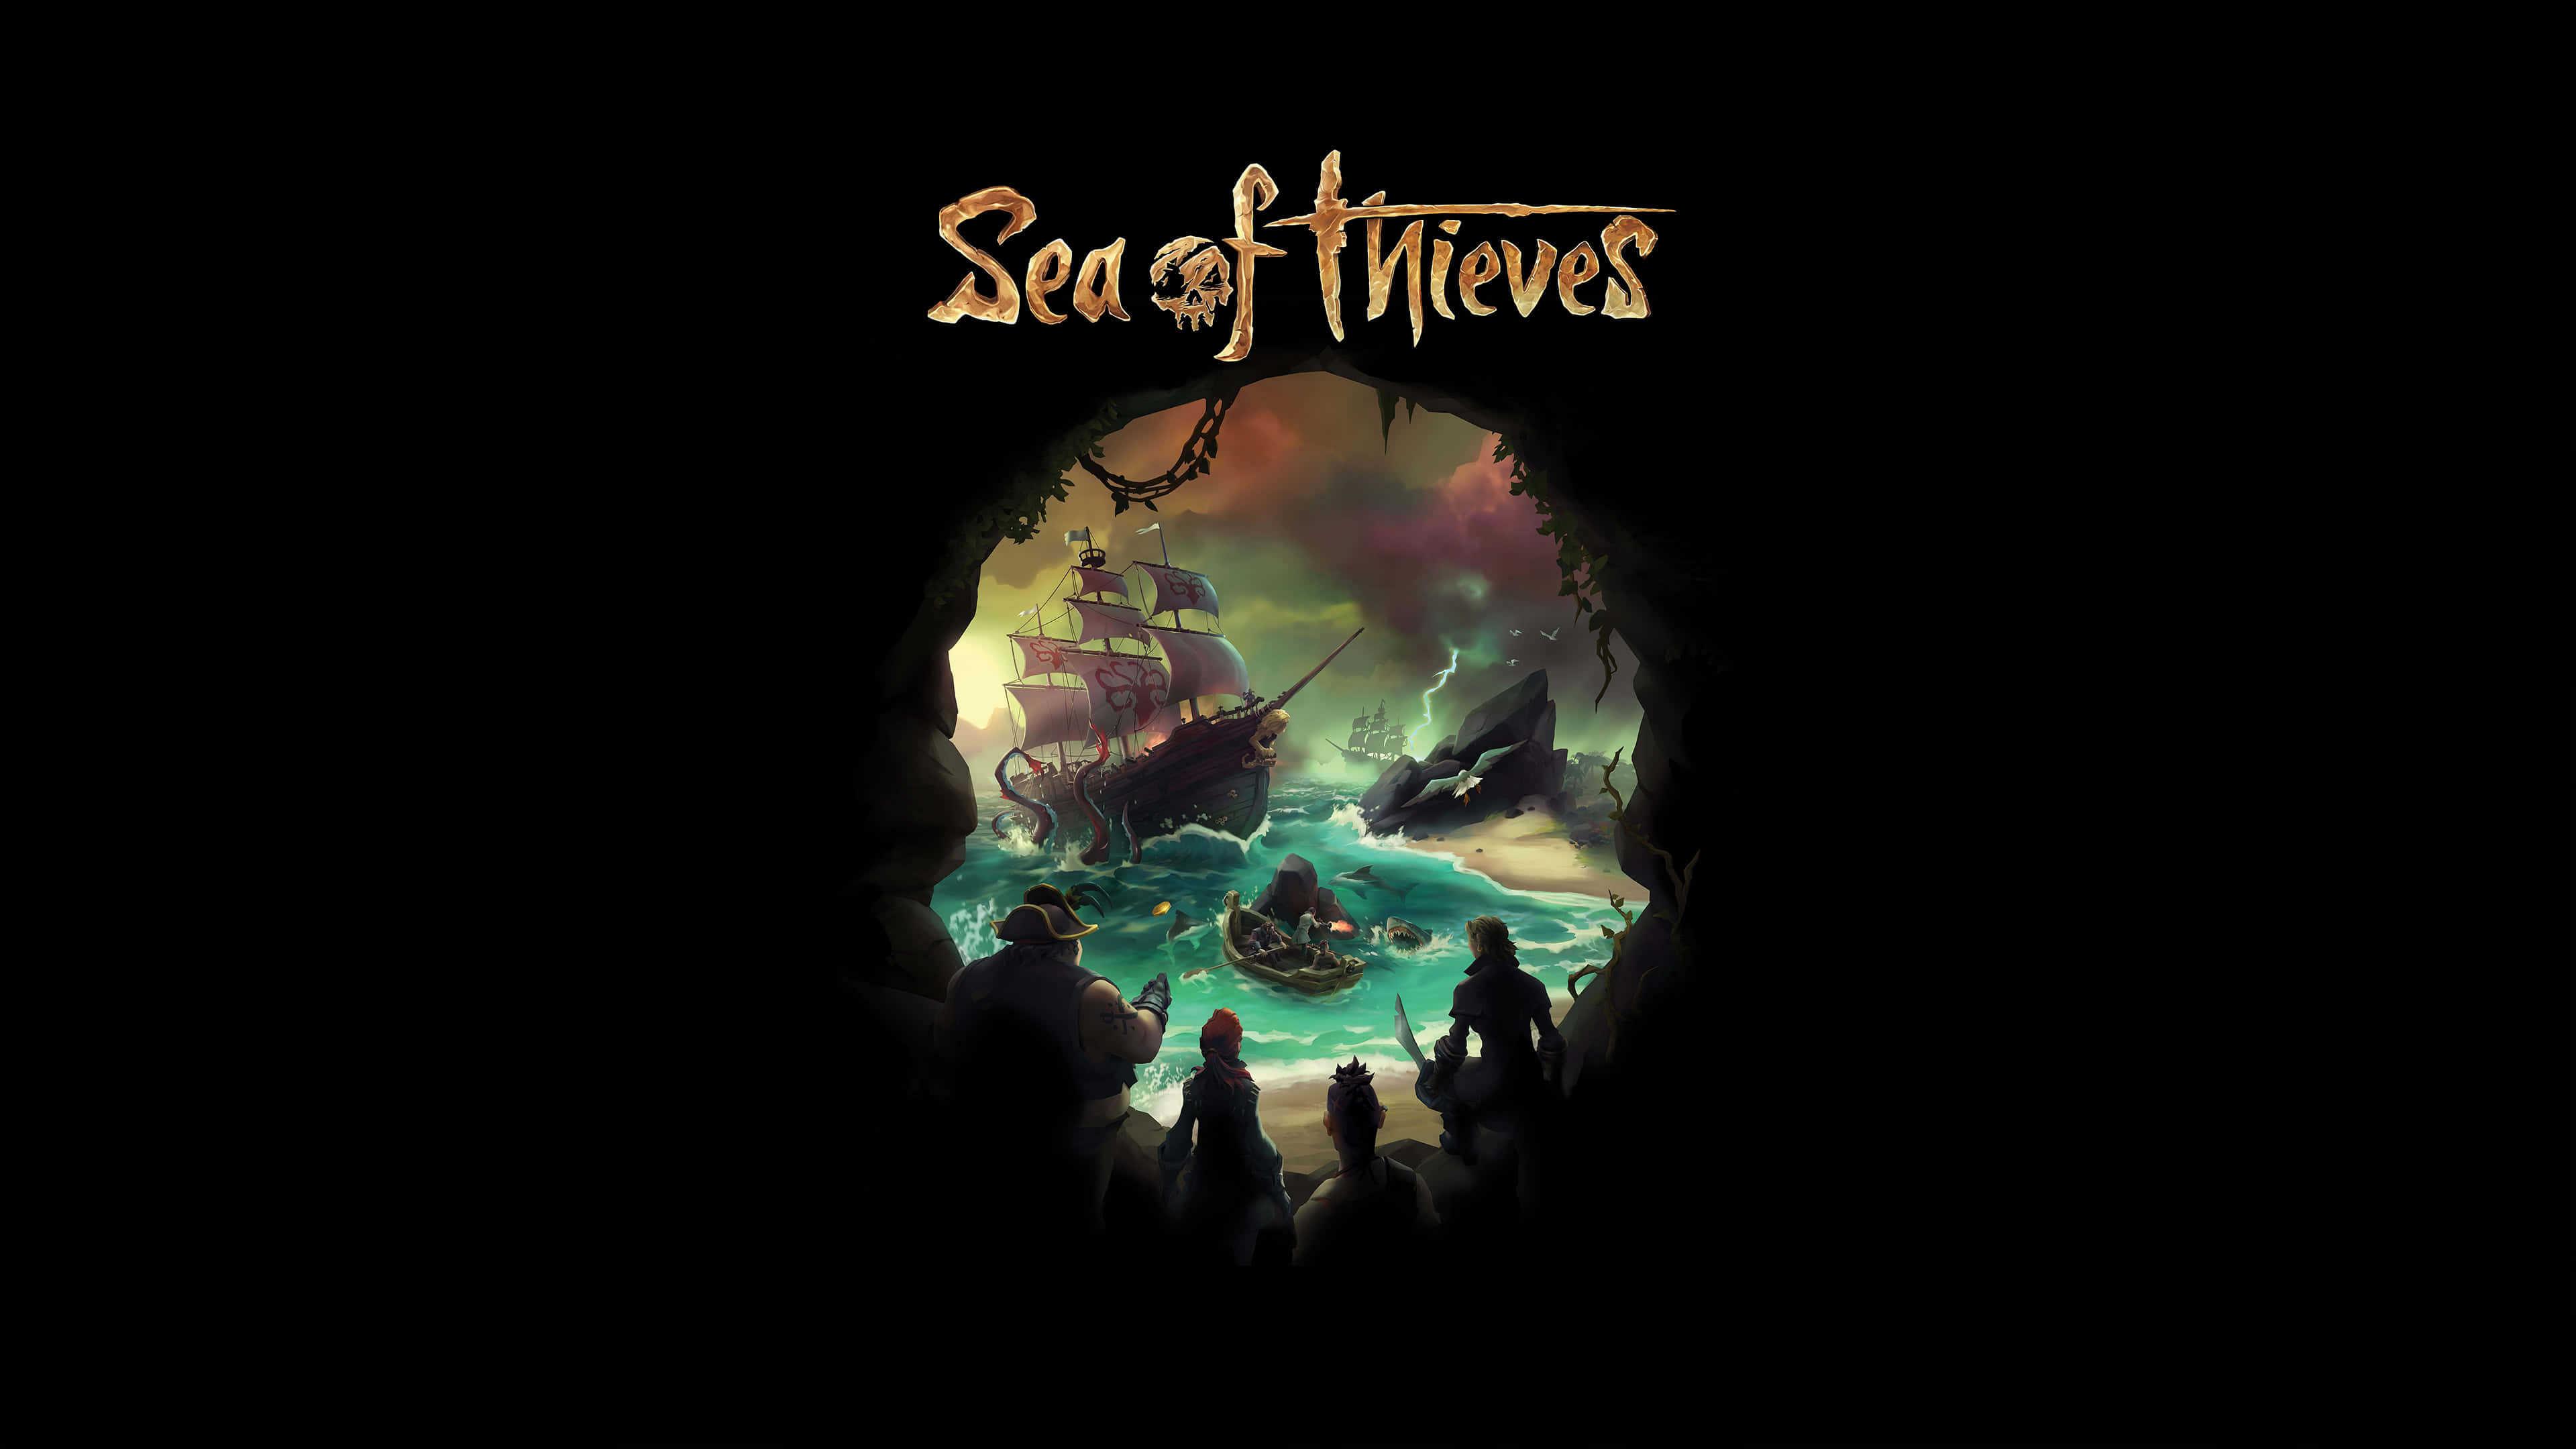 New Trucks 2018 >> Sea Of Thieves Logo UHD 4K Wallpaper | Pixelz